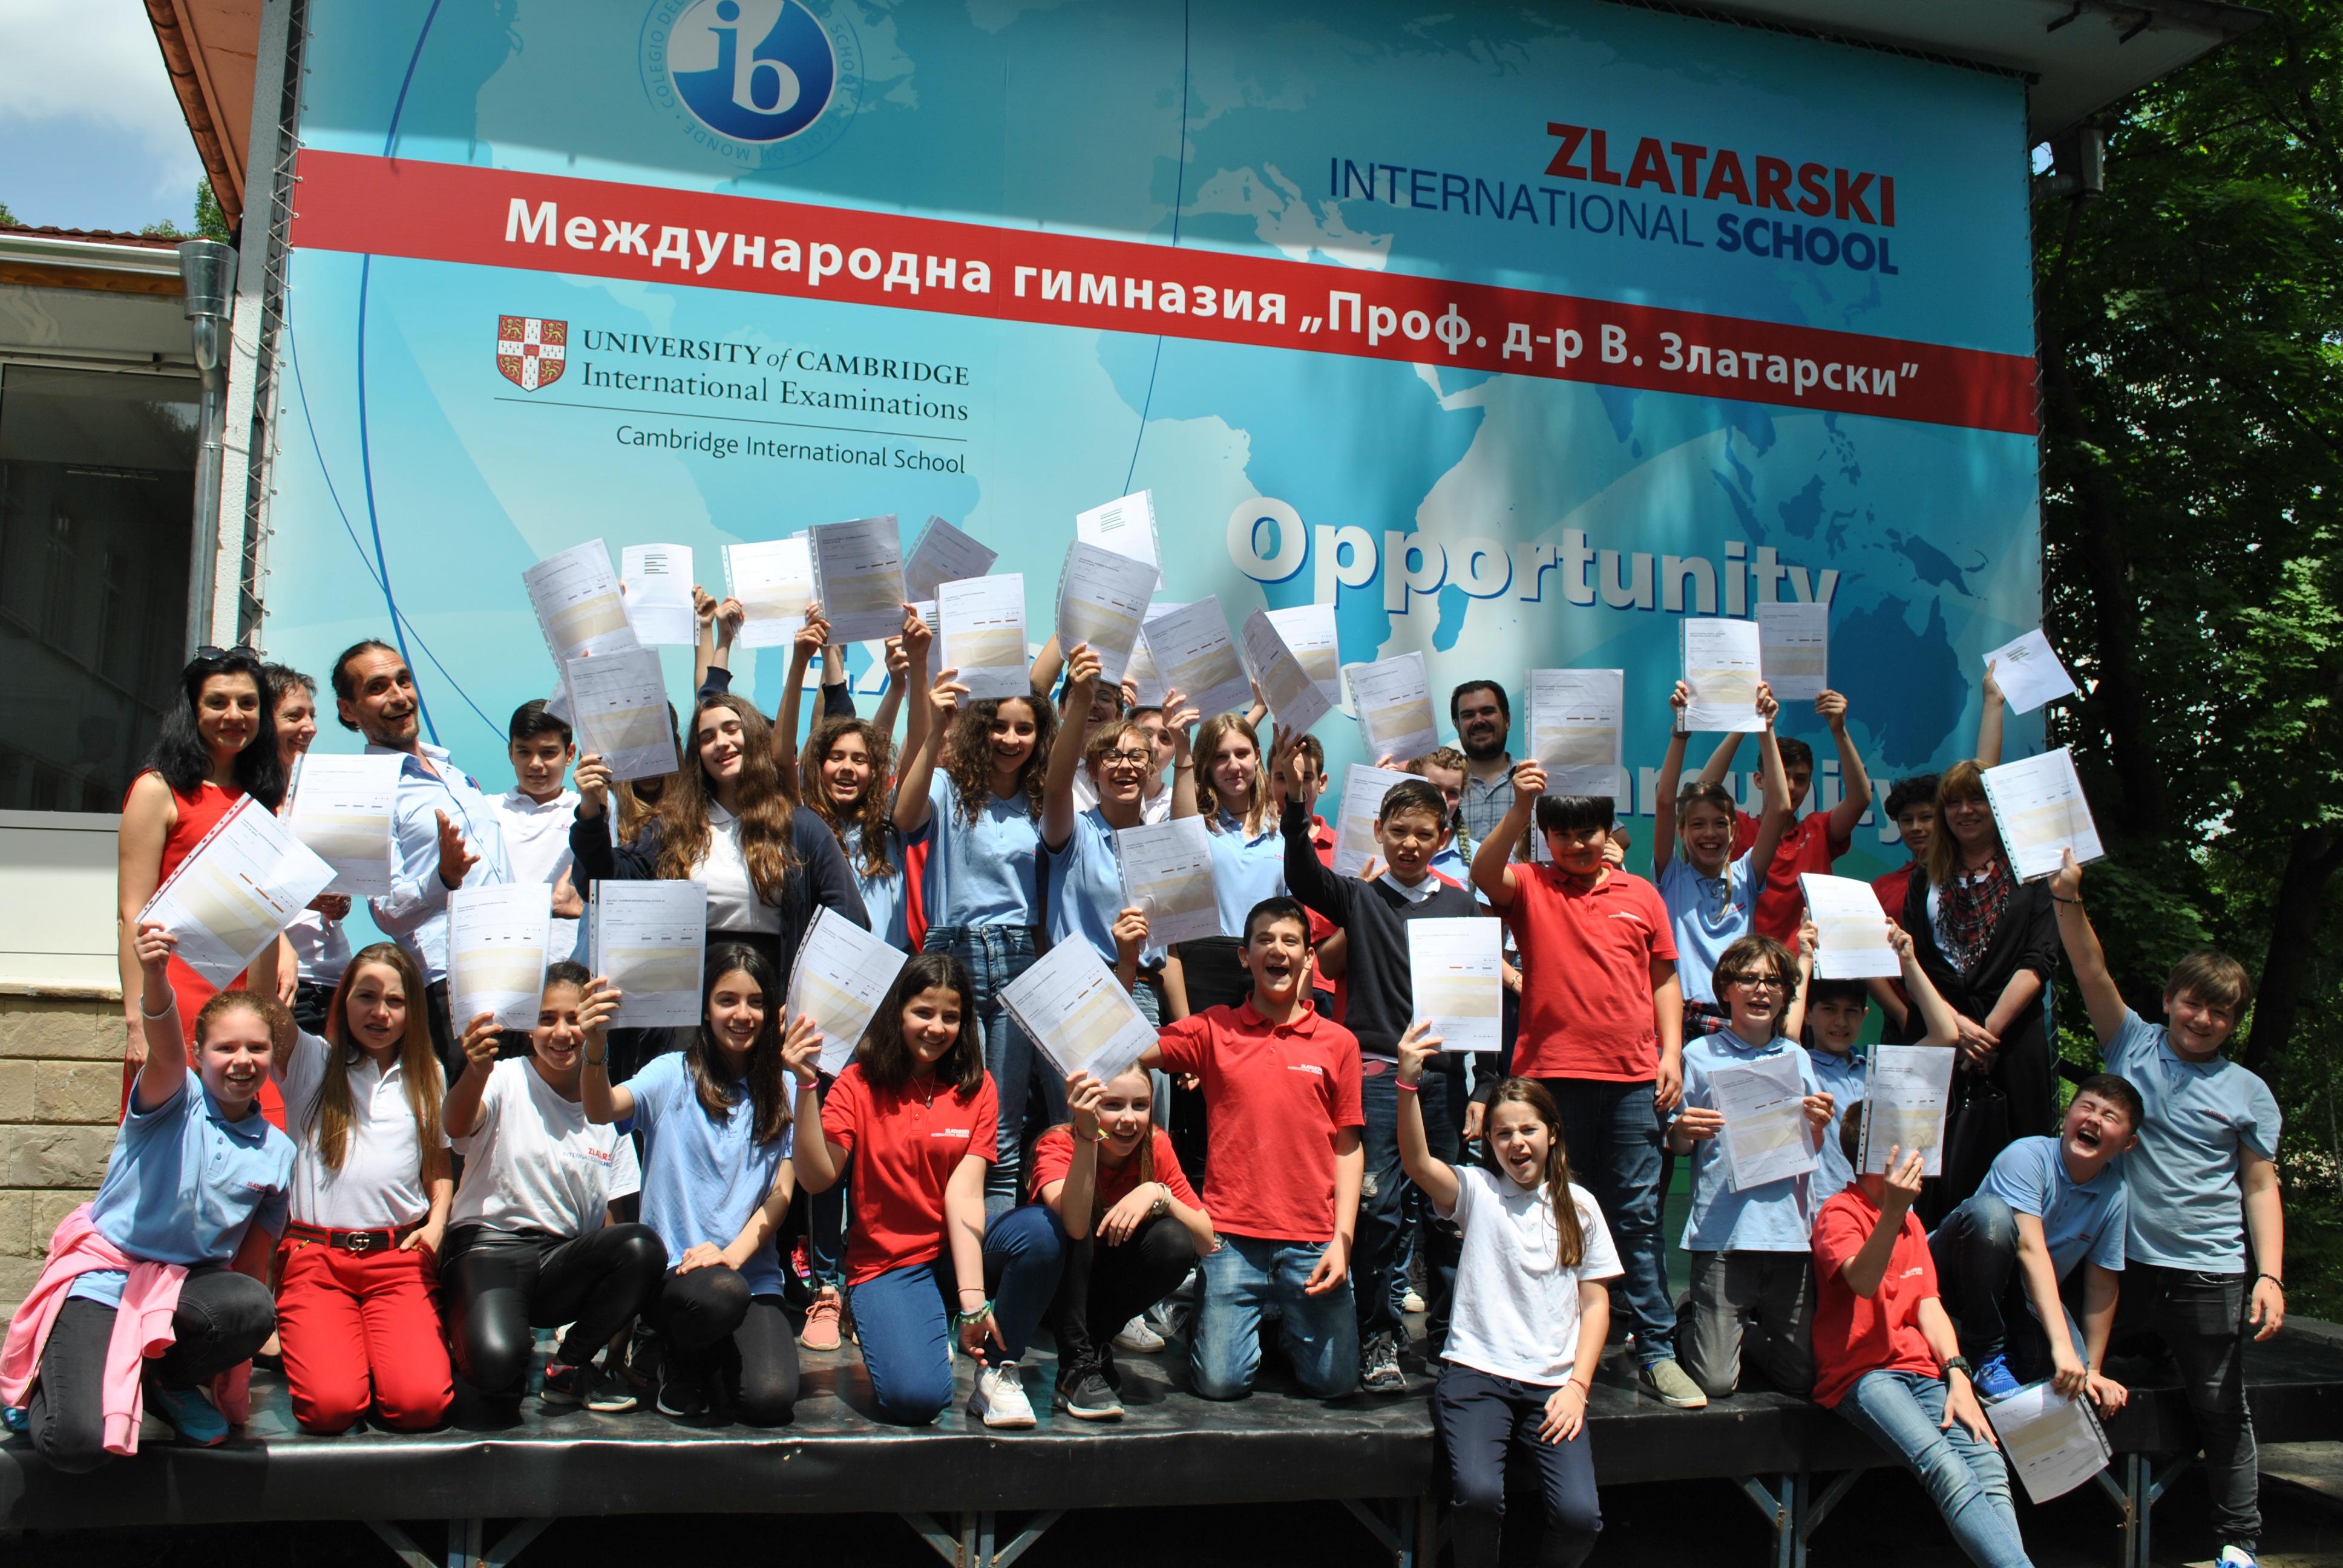 Успешни резултати на Cambridge Secondary на учениците от 5-7. клас на Международно училище Златарски